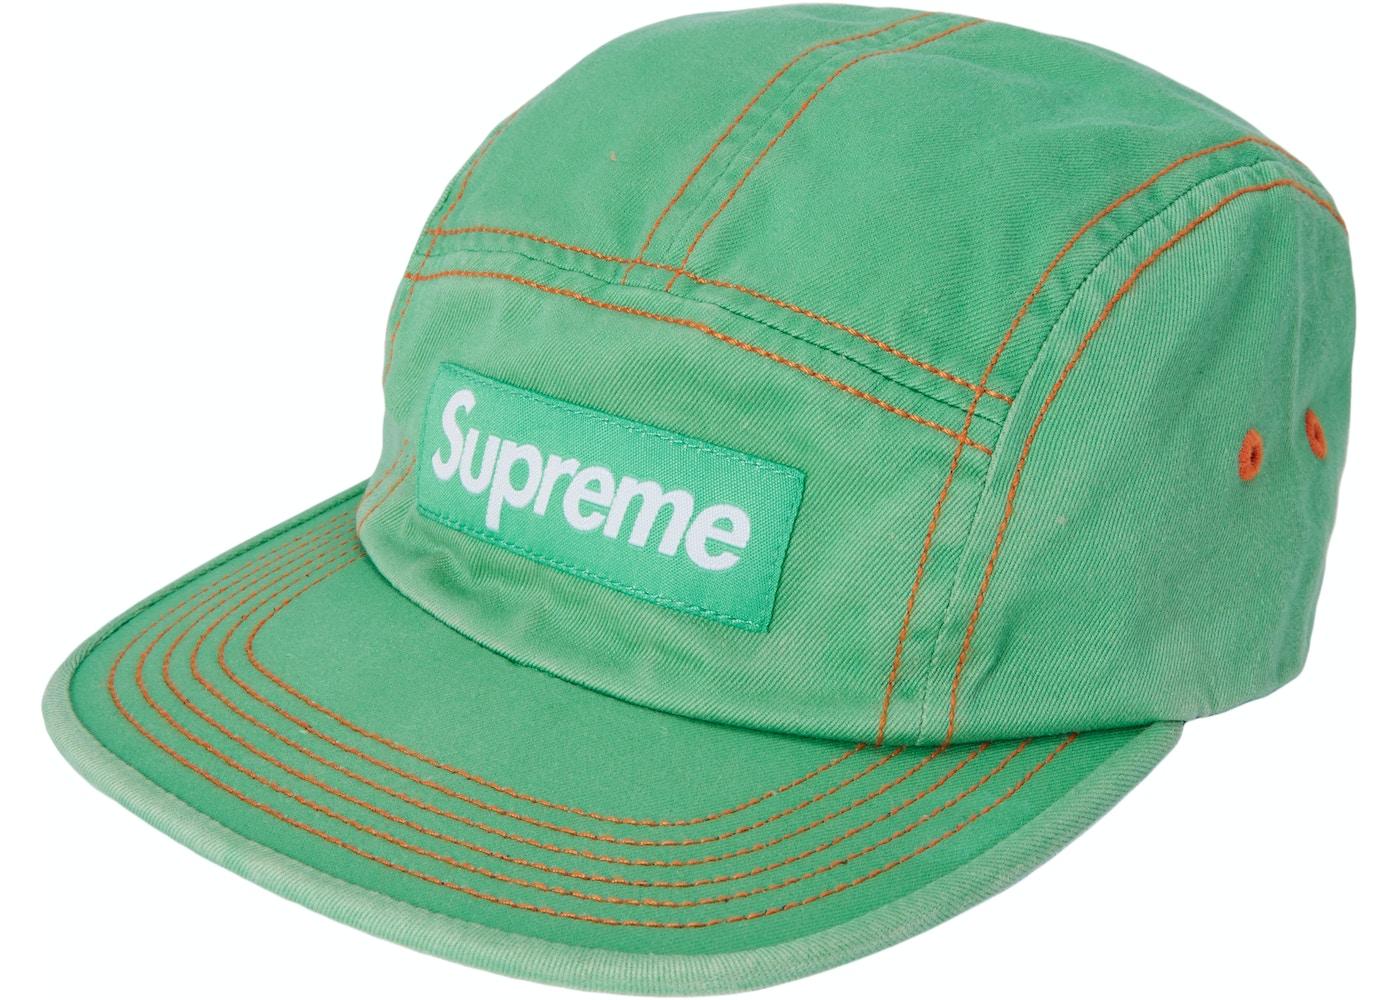 188a2054985 Buy   Sell Streetwear - Supreme